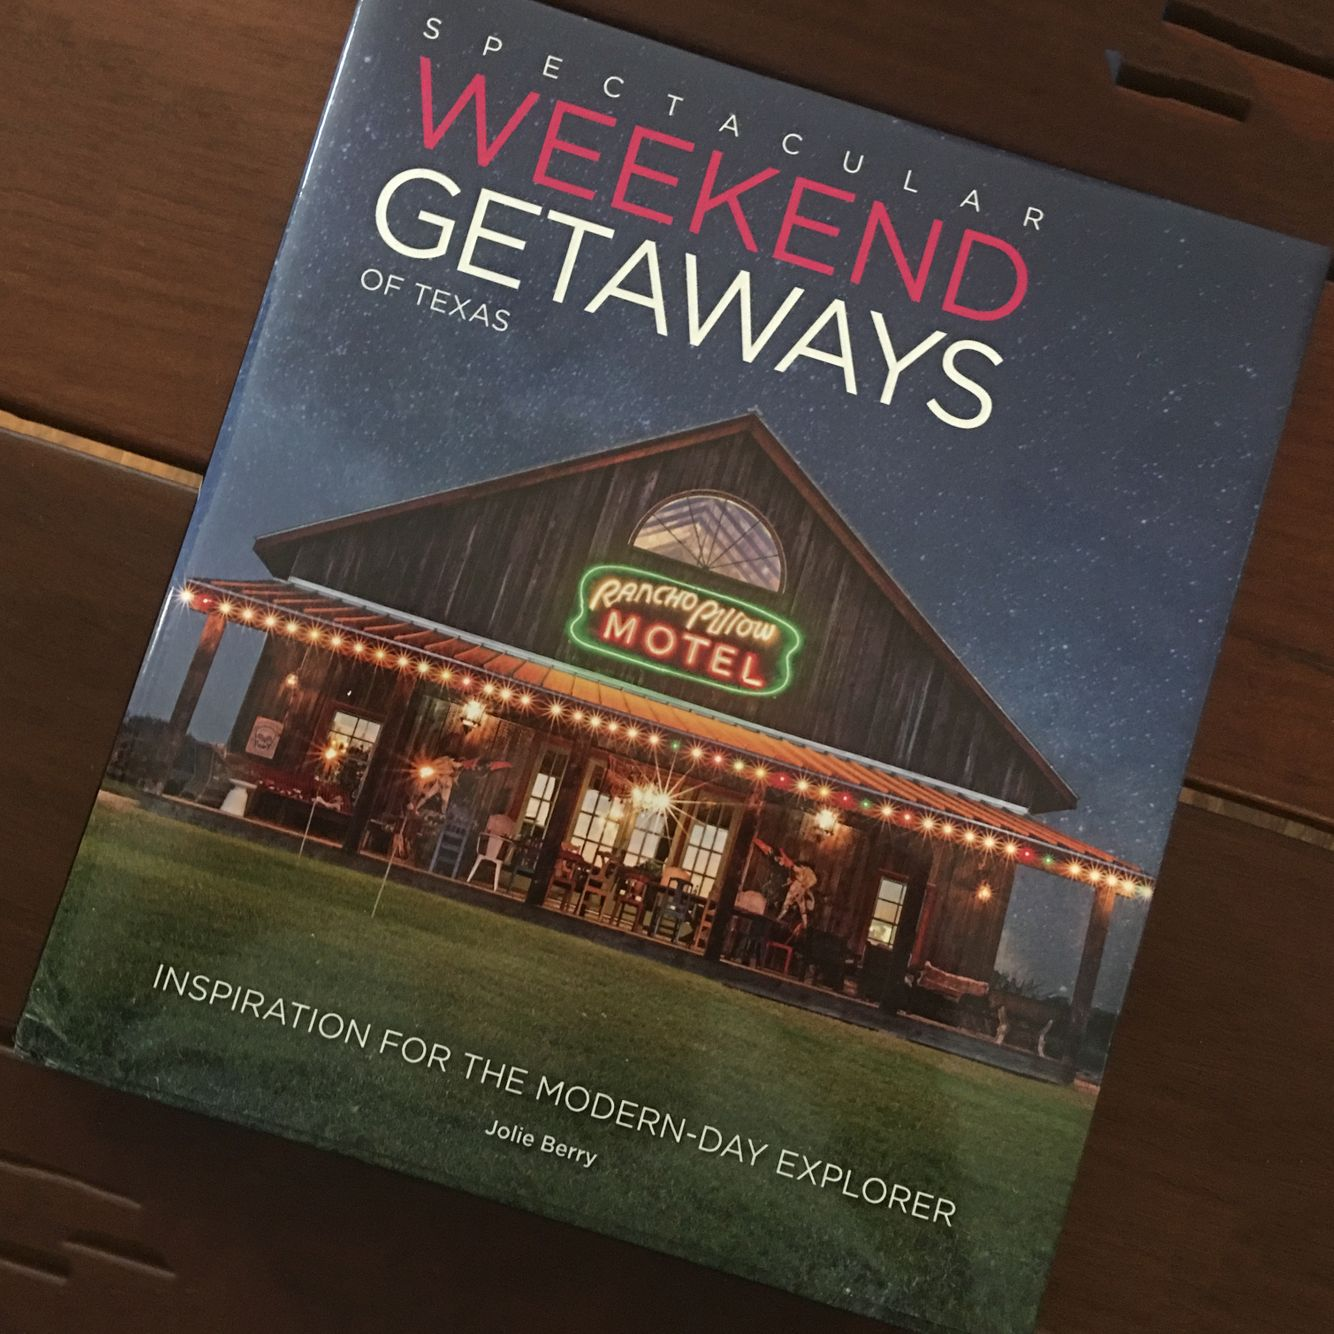 Spectacular Weekend Getaways of Texas